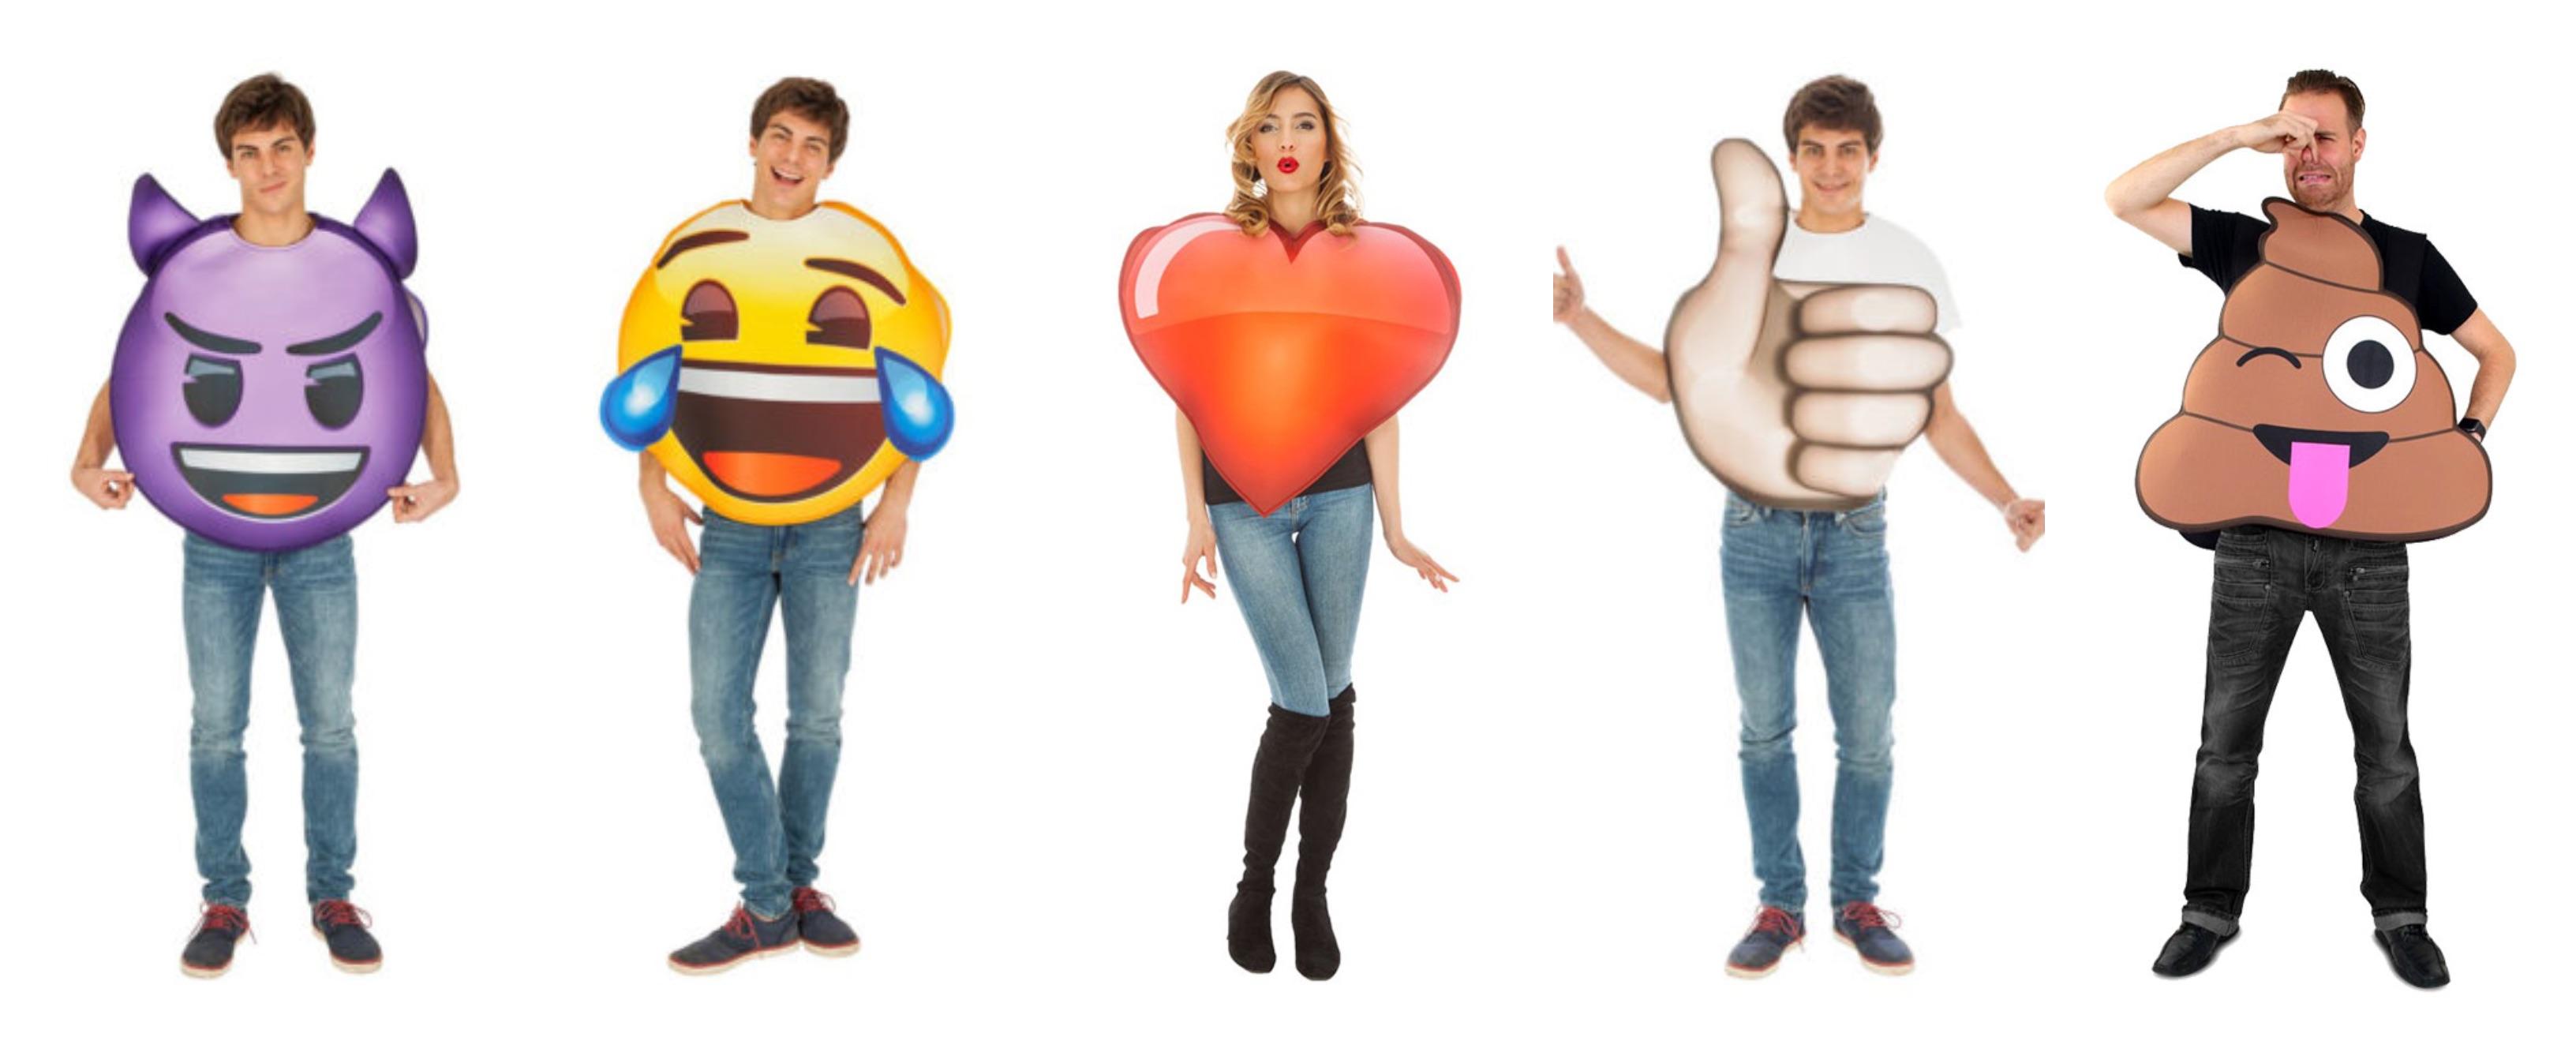 emoji kostume til voksne - Emoji kostume til voksne